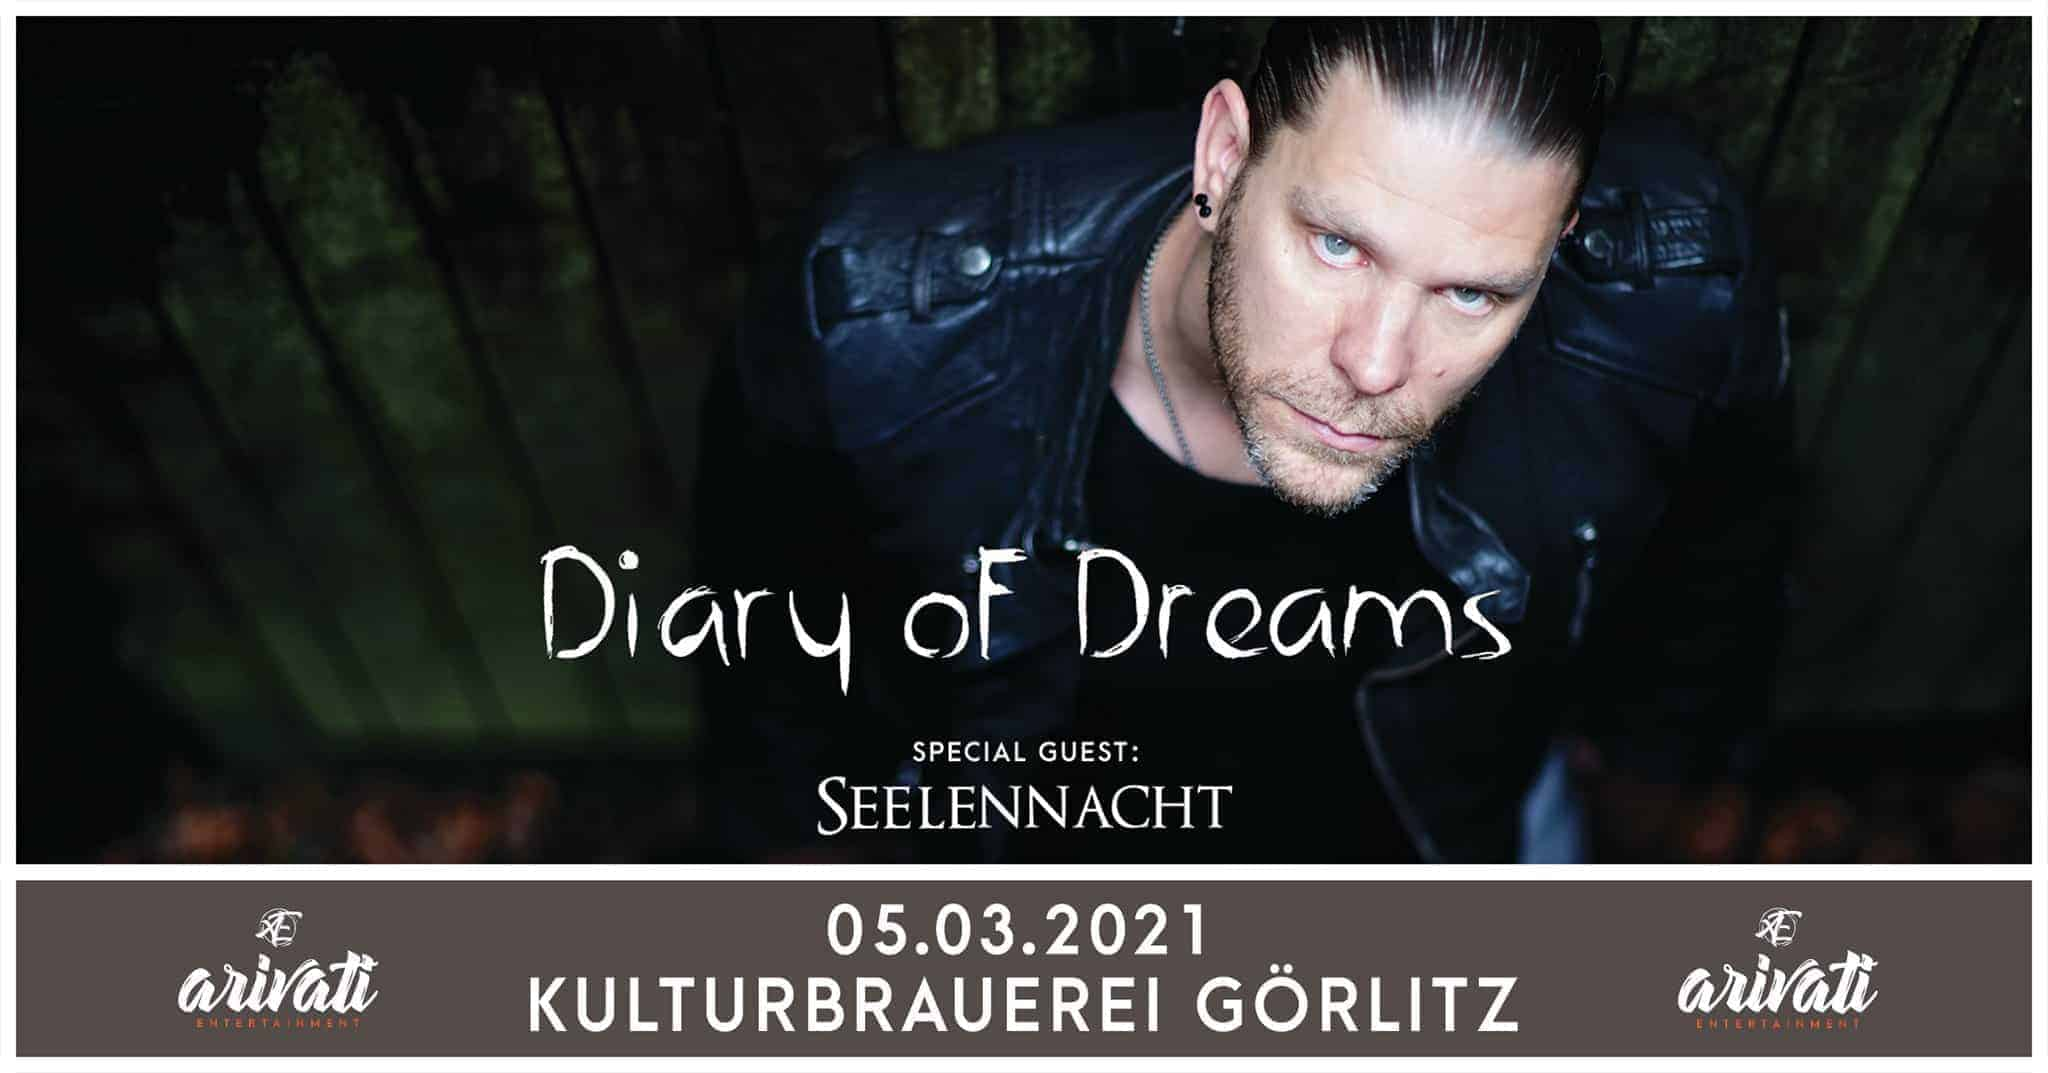 05.03.2021 Diary of Dreams + Seelennacht - Görlitz Kulturbrauerei